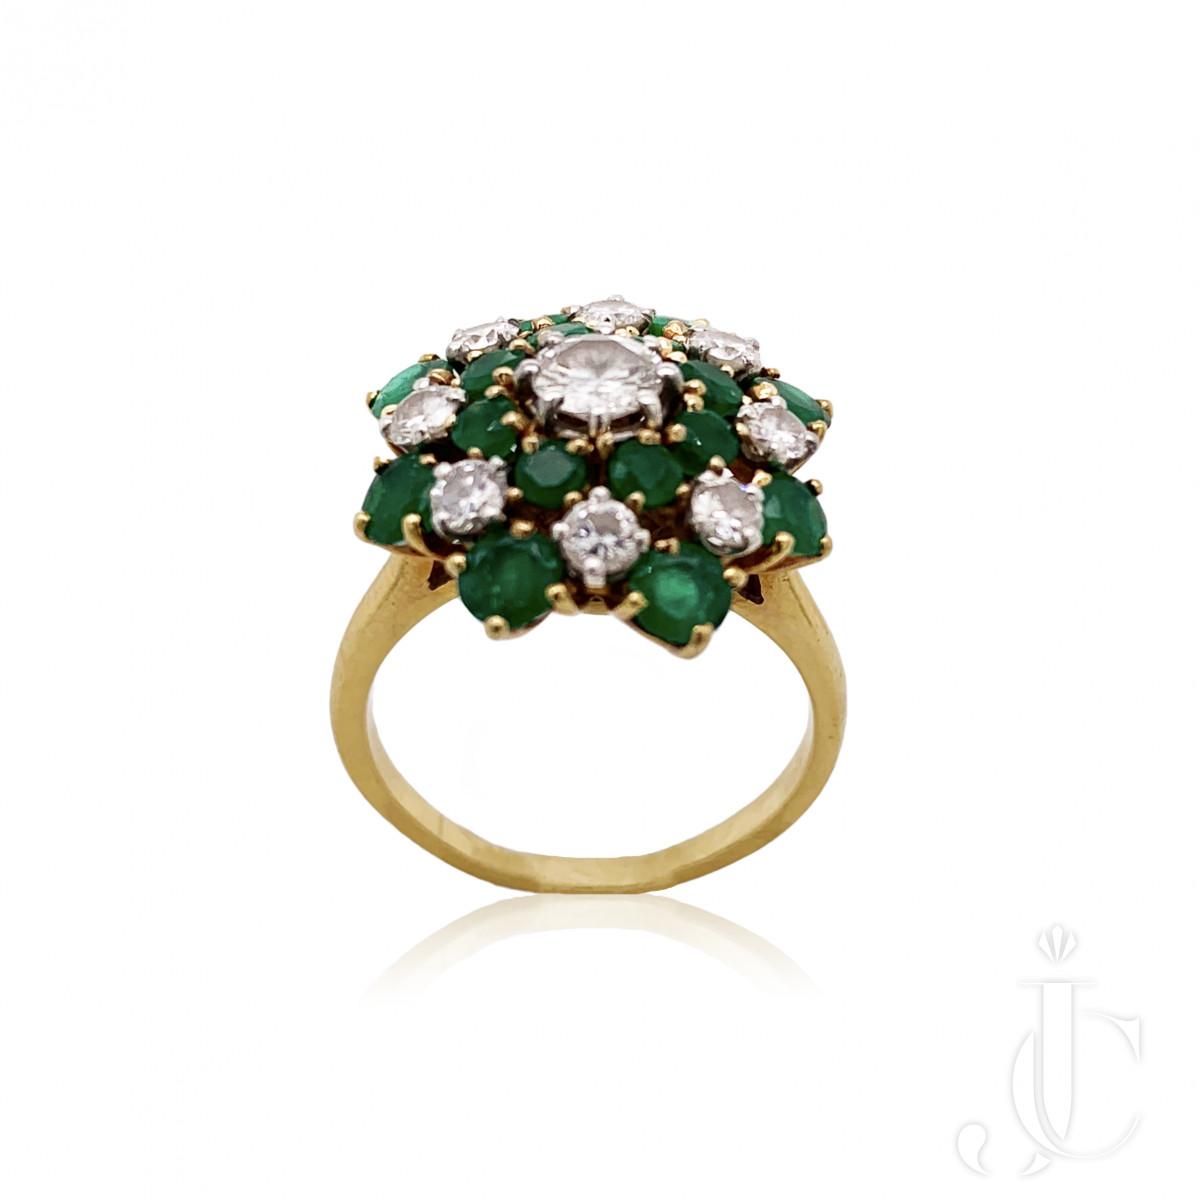 Van Cleef & Arpels Yellow Gold Emerald & Diamond Ring